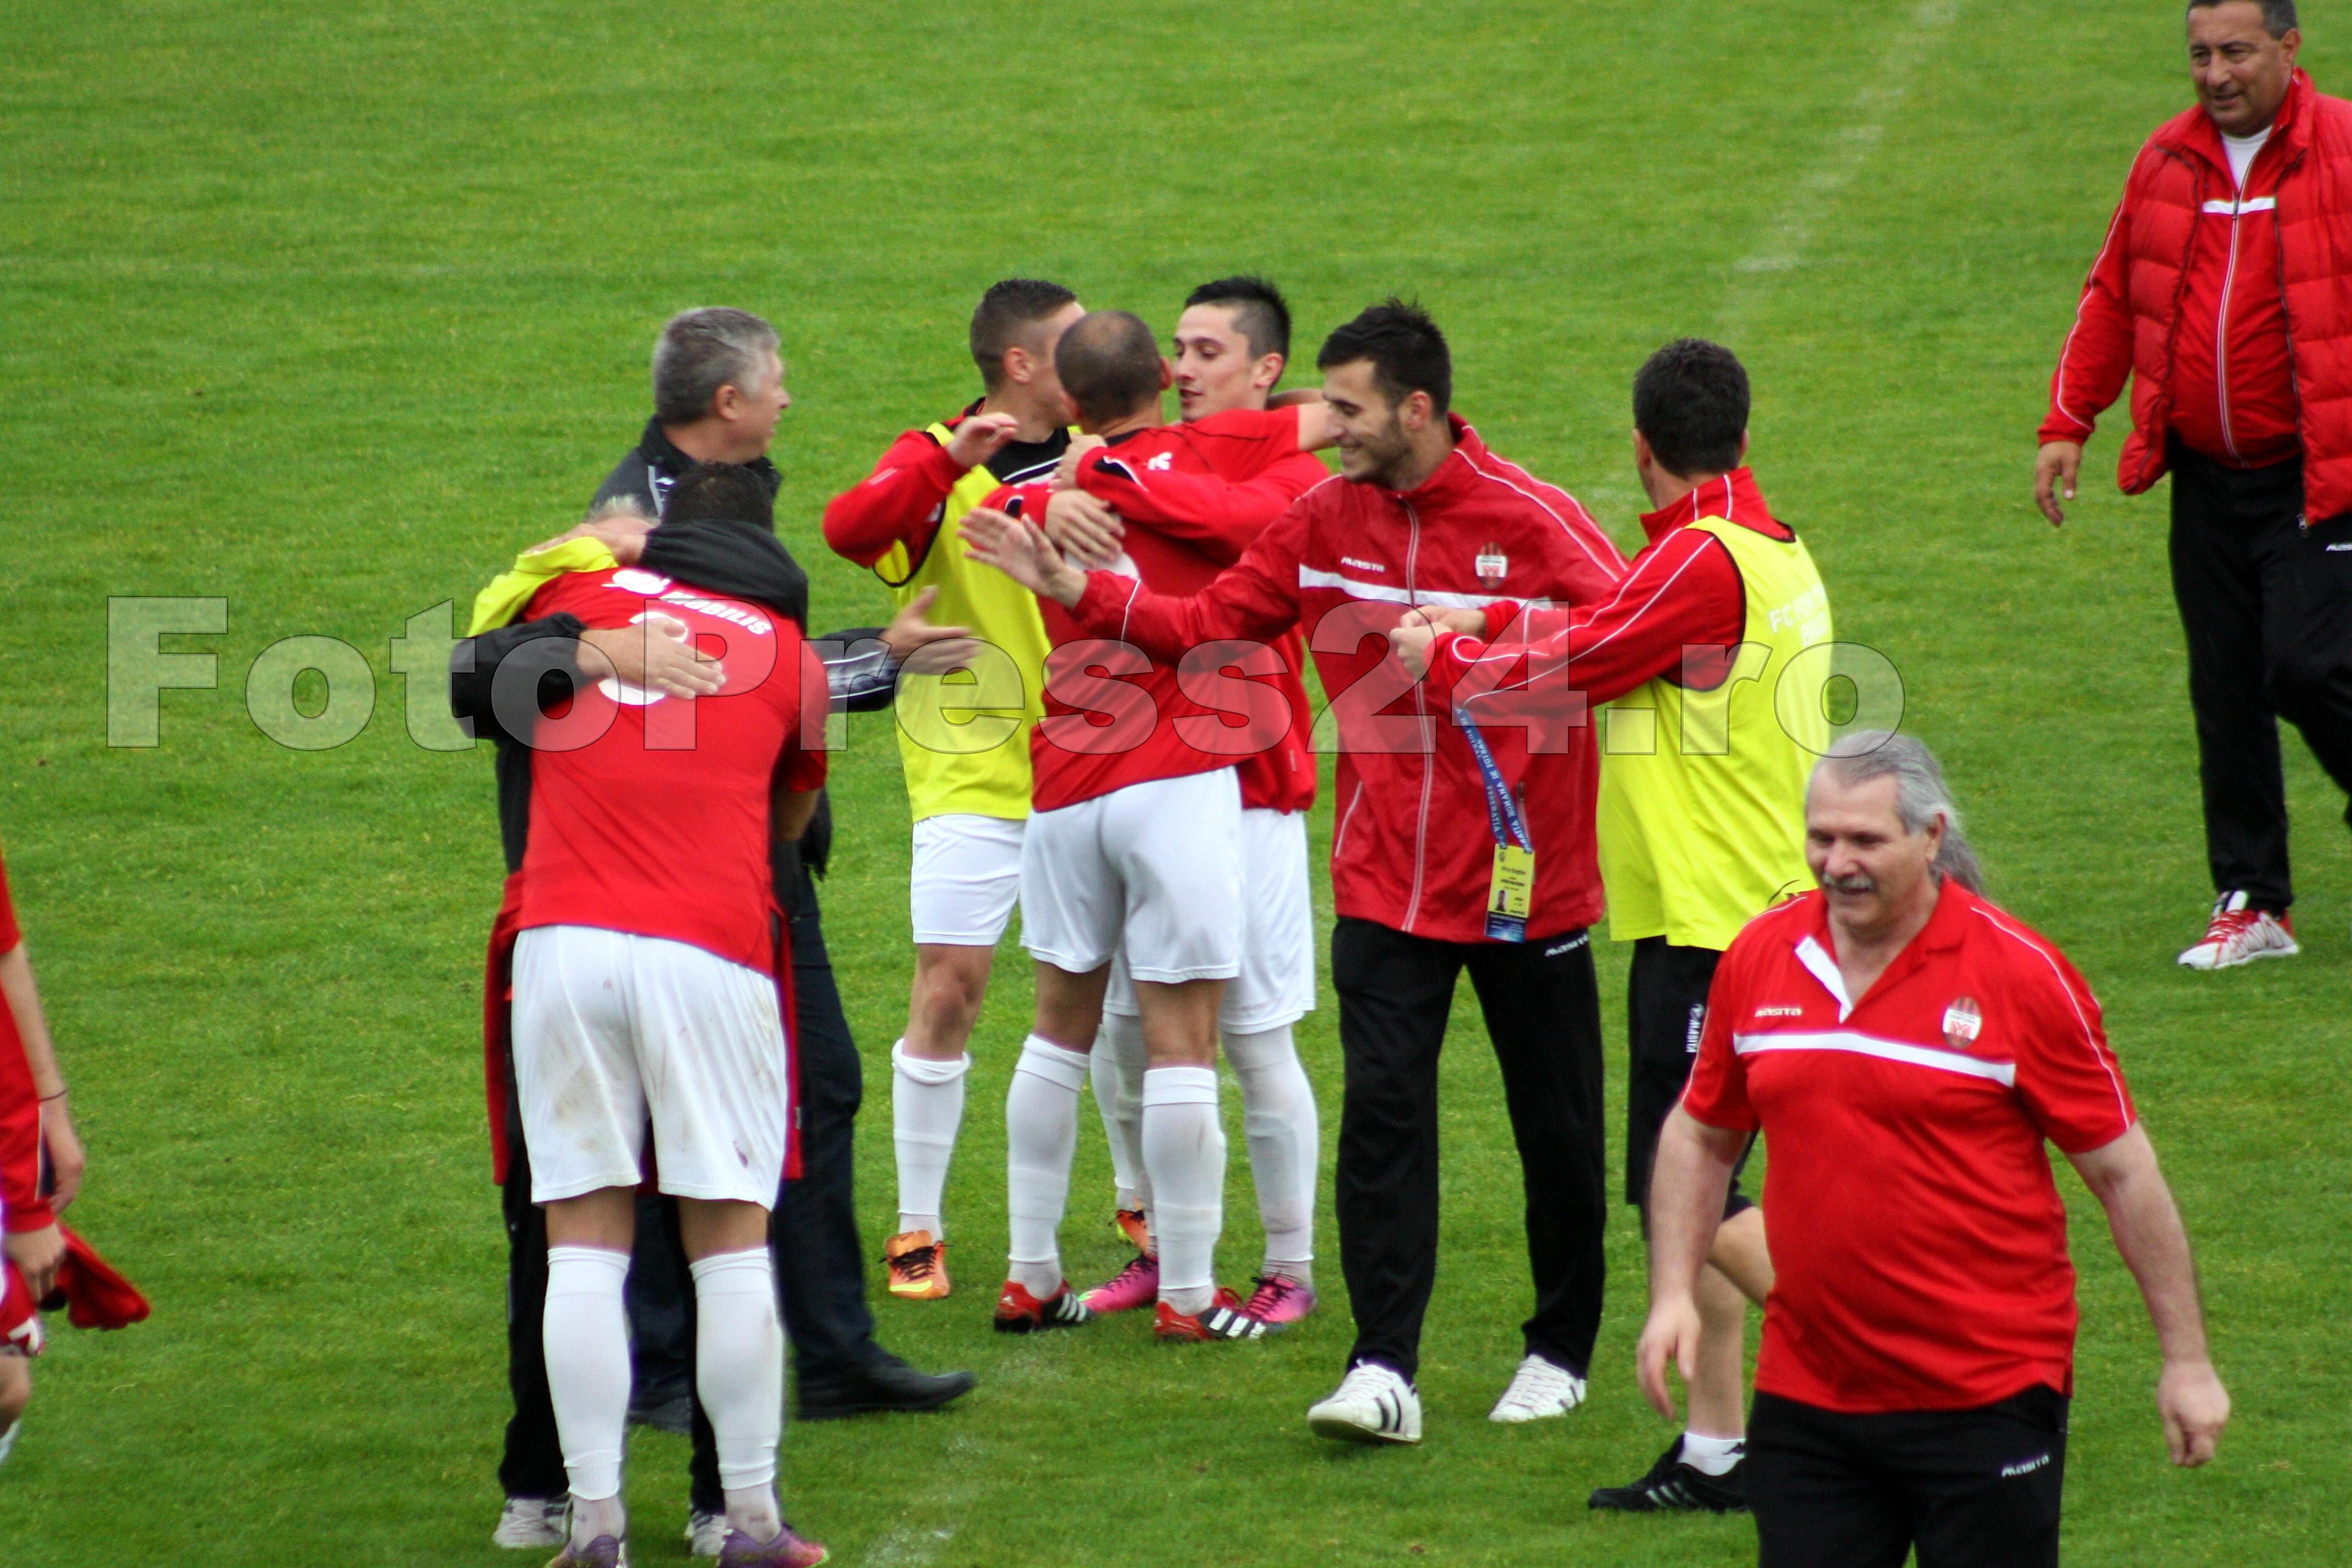 fotbal scm pitesti-foto-Mihai Neacsu (63)